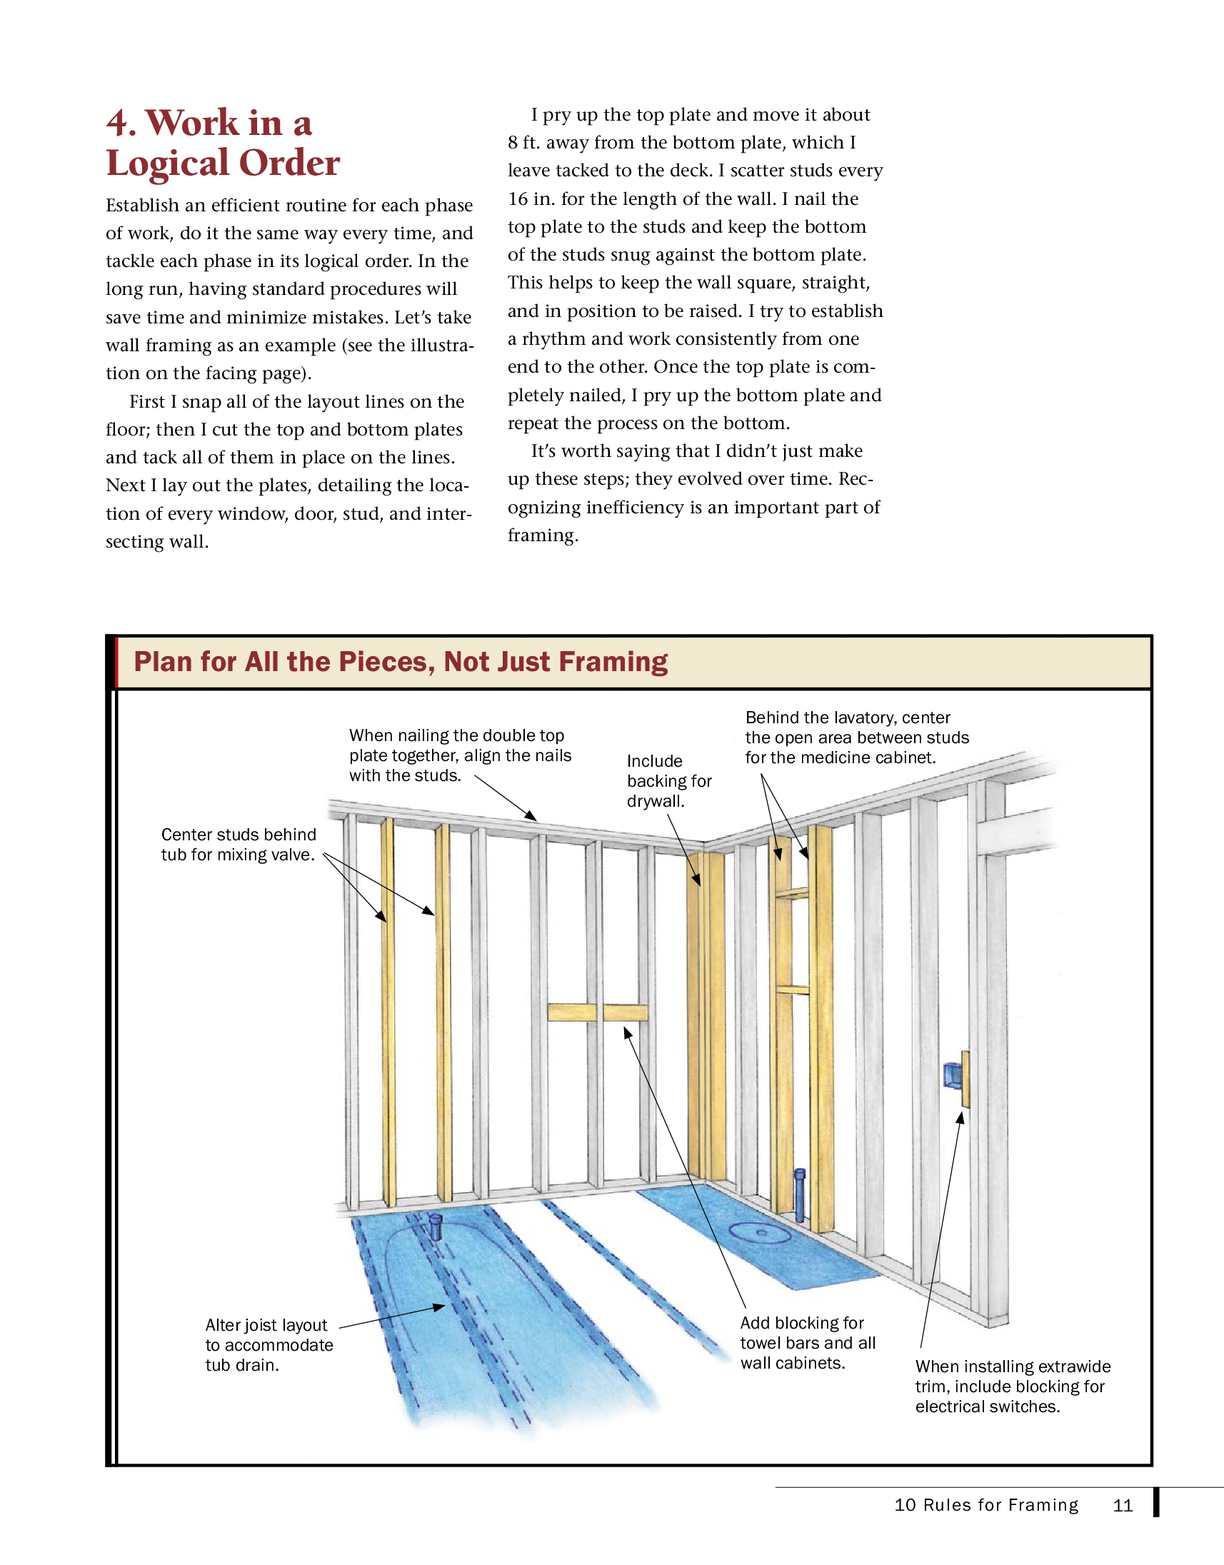 FHB FPBP Framing Walls Floors and Ceilings - CALAMEO Downloader